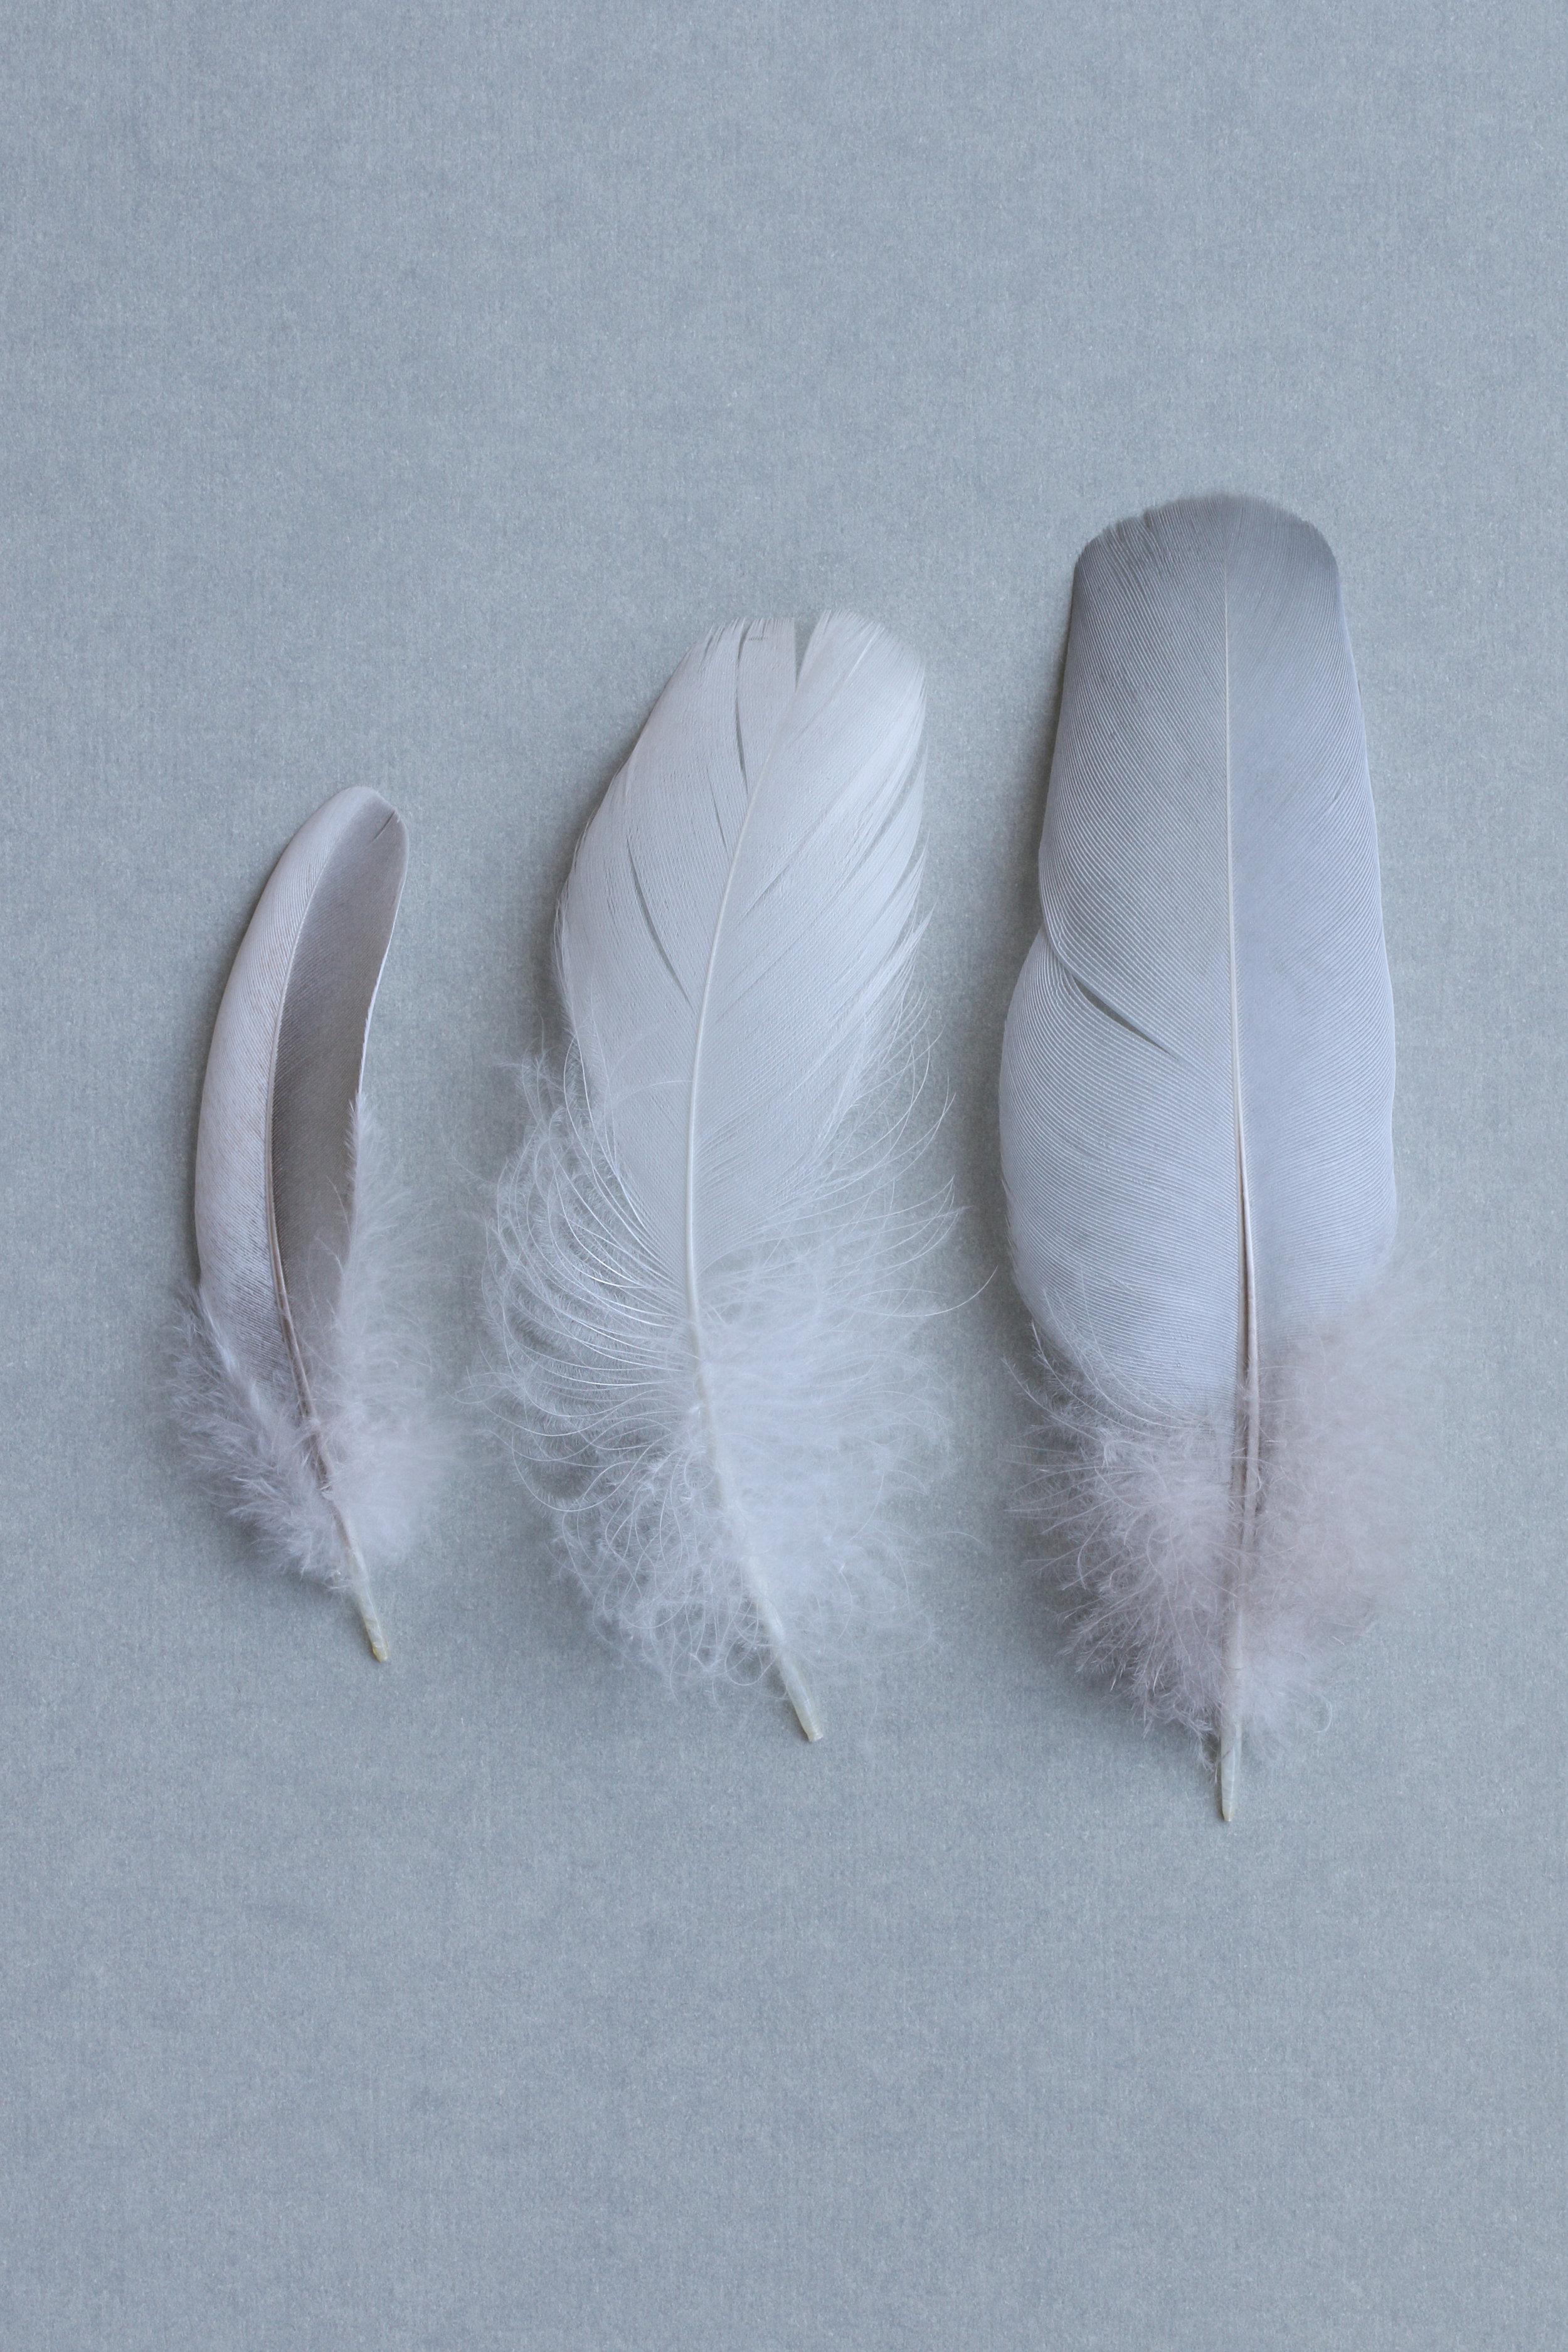 Three Feathers on Grey